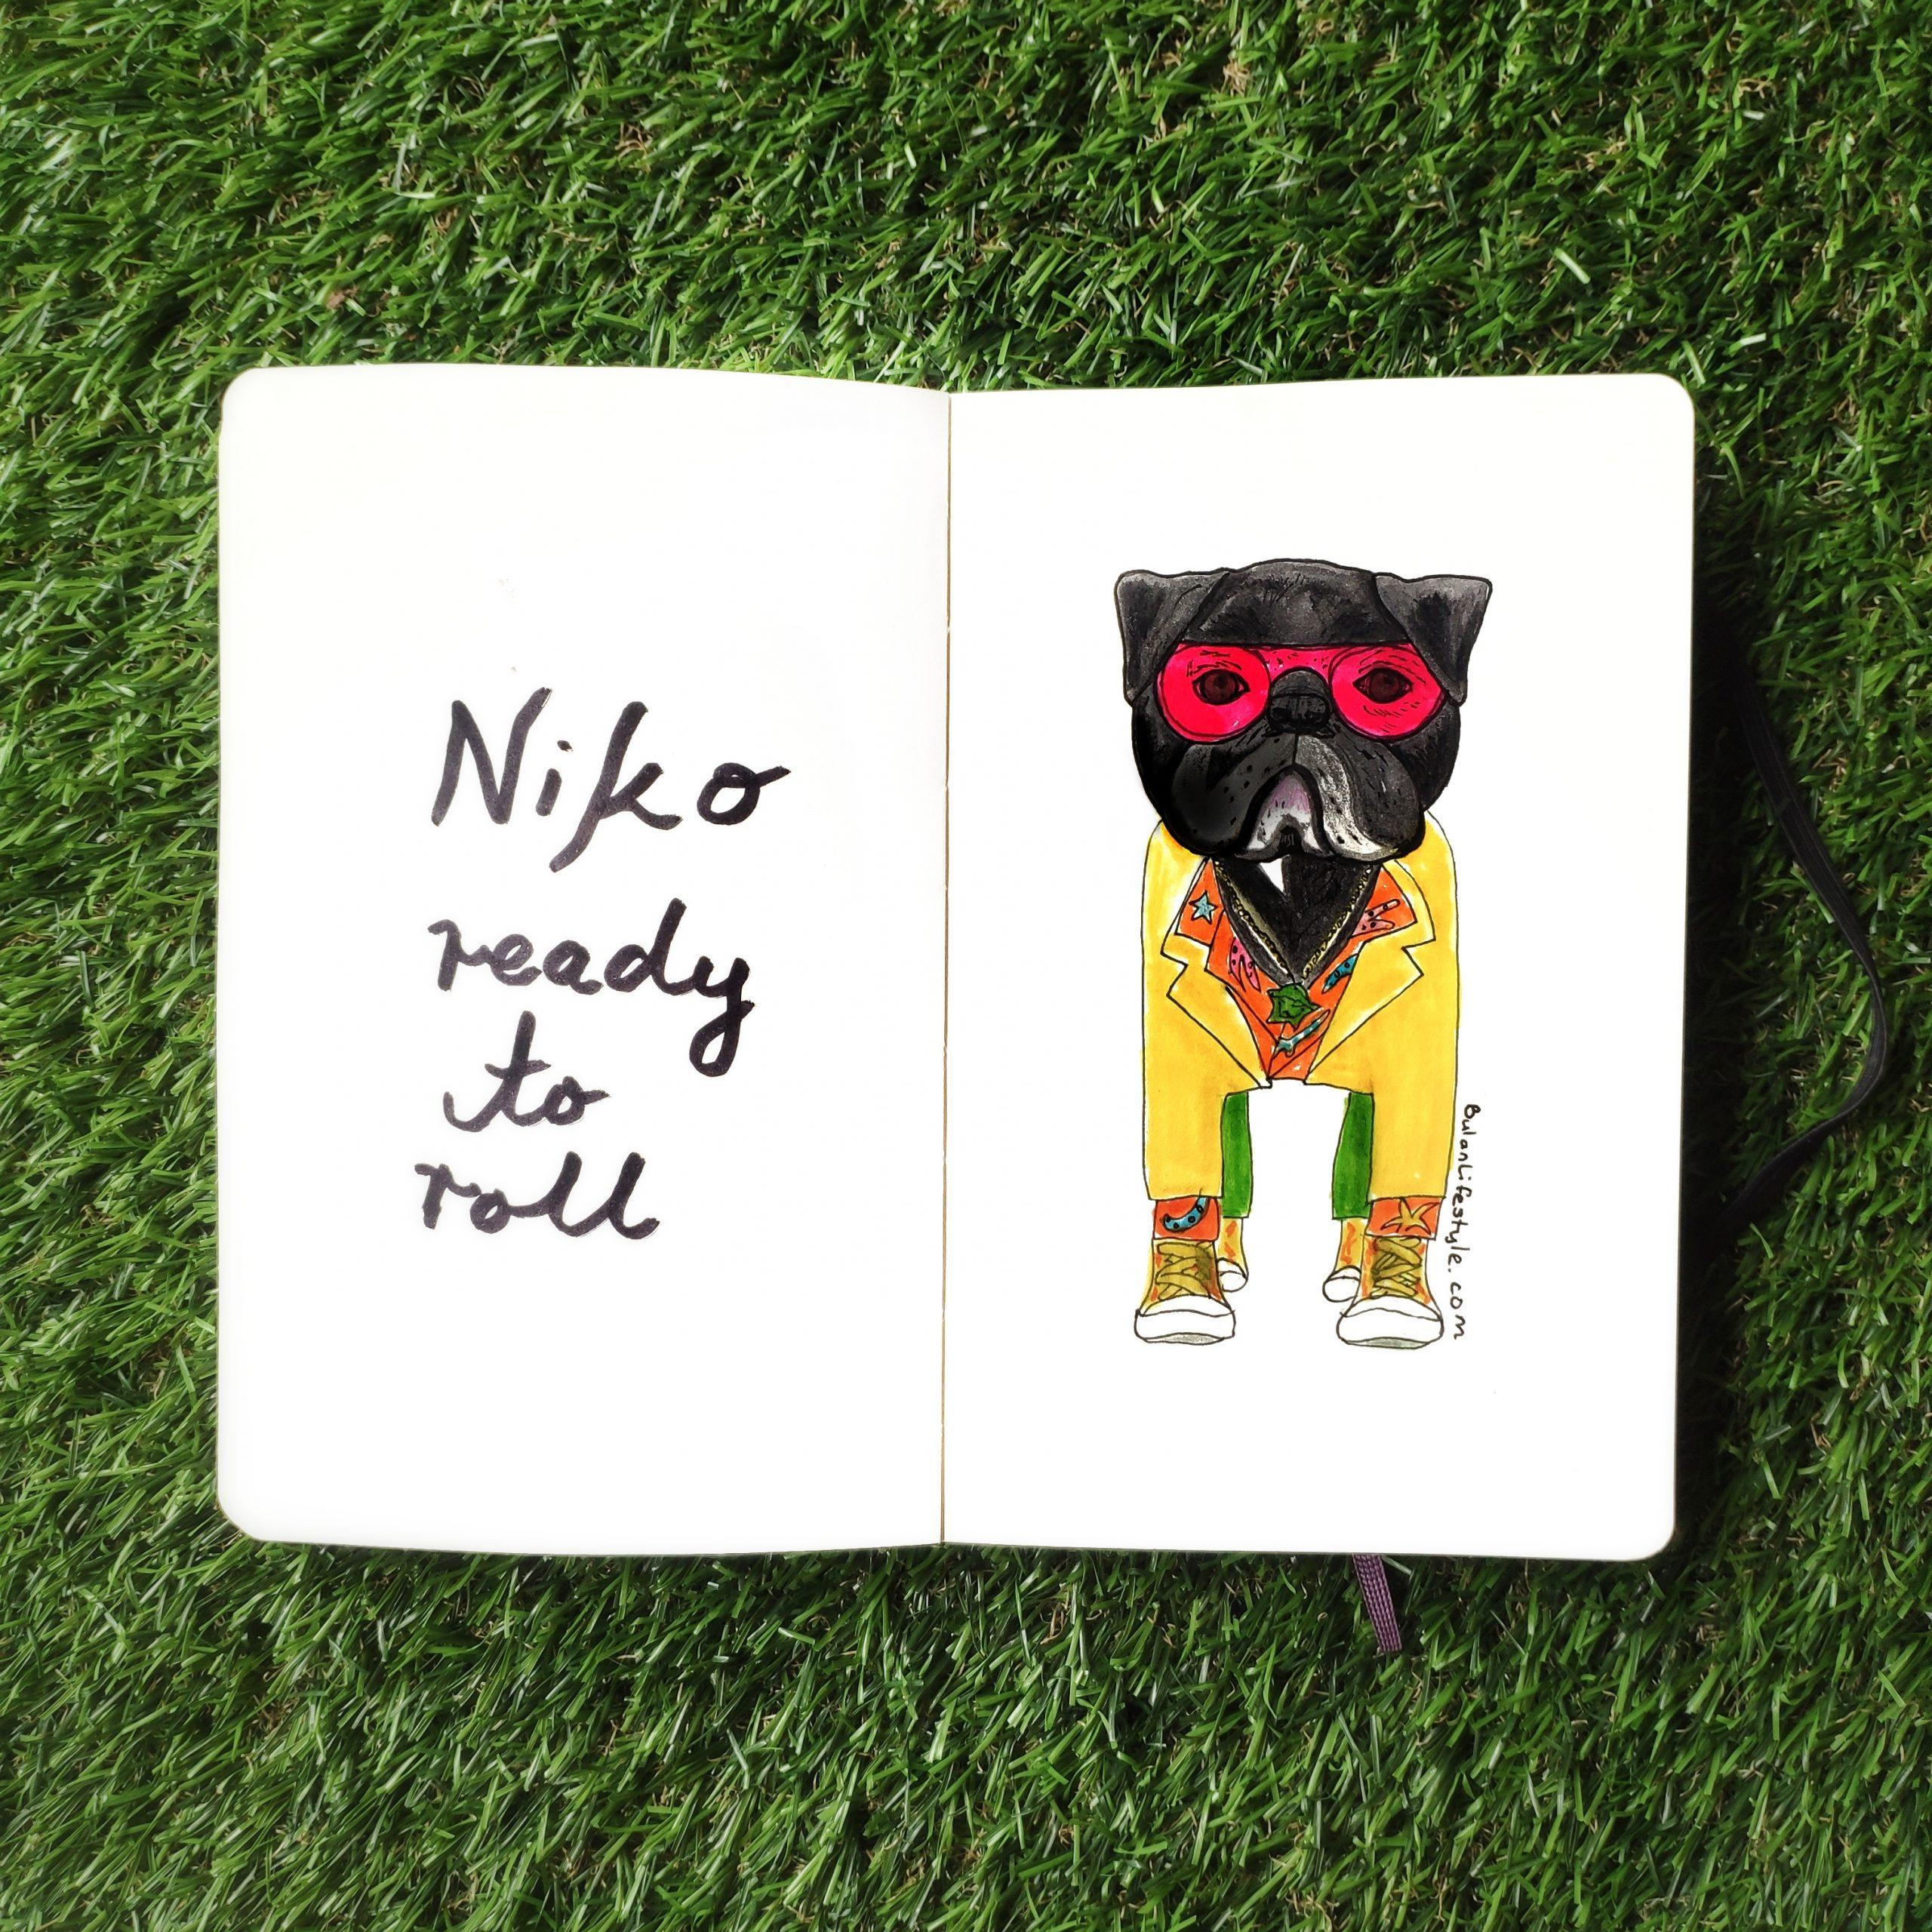 Dog fashion portrait : Niko